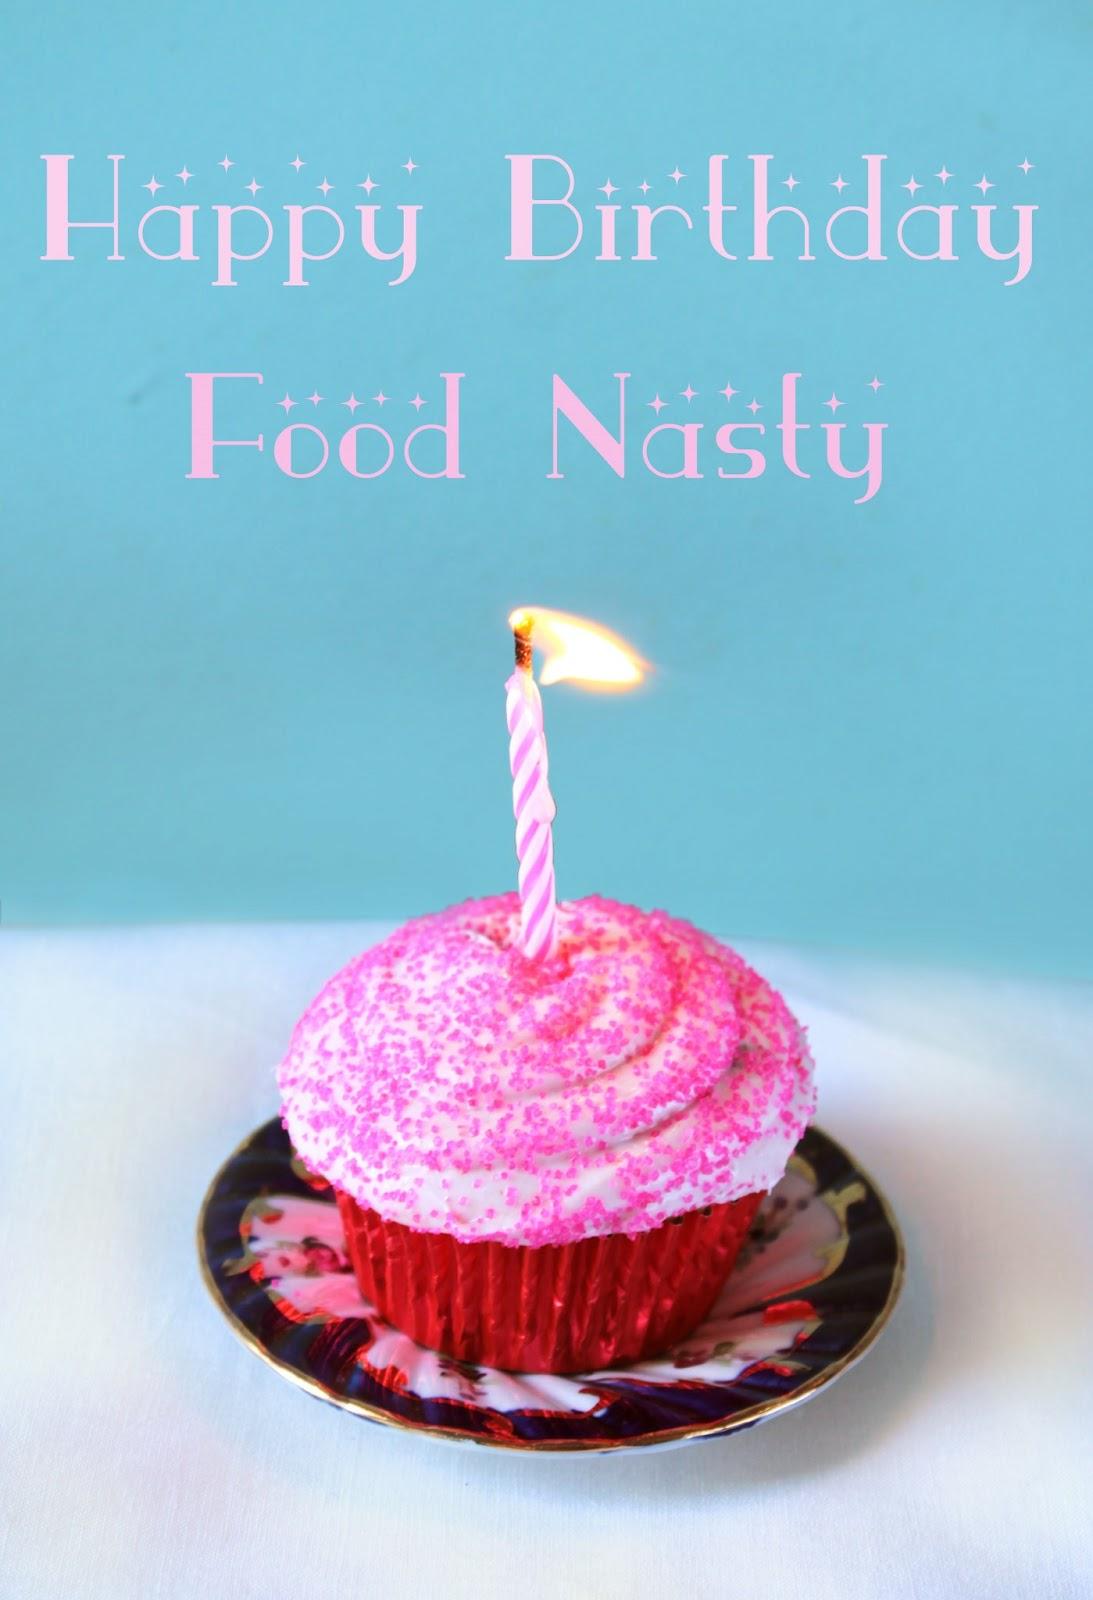 Food Nasty Happy Birthday Cupcakes